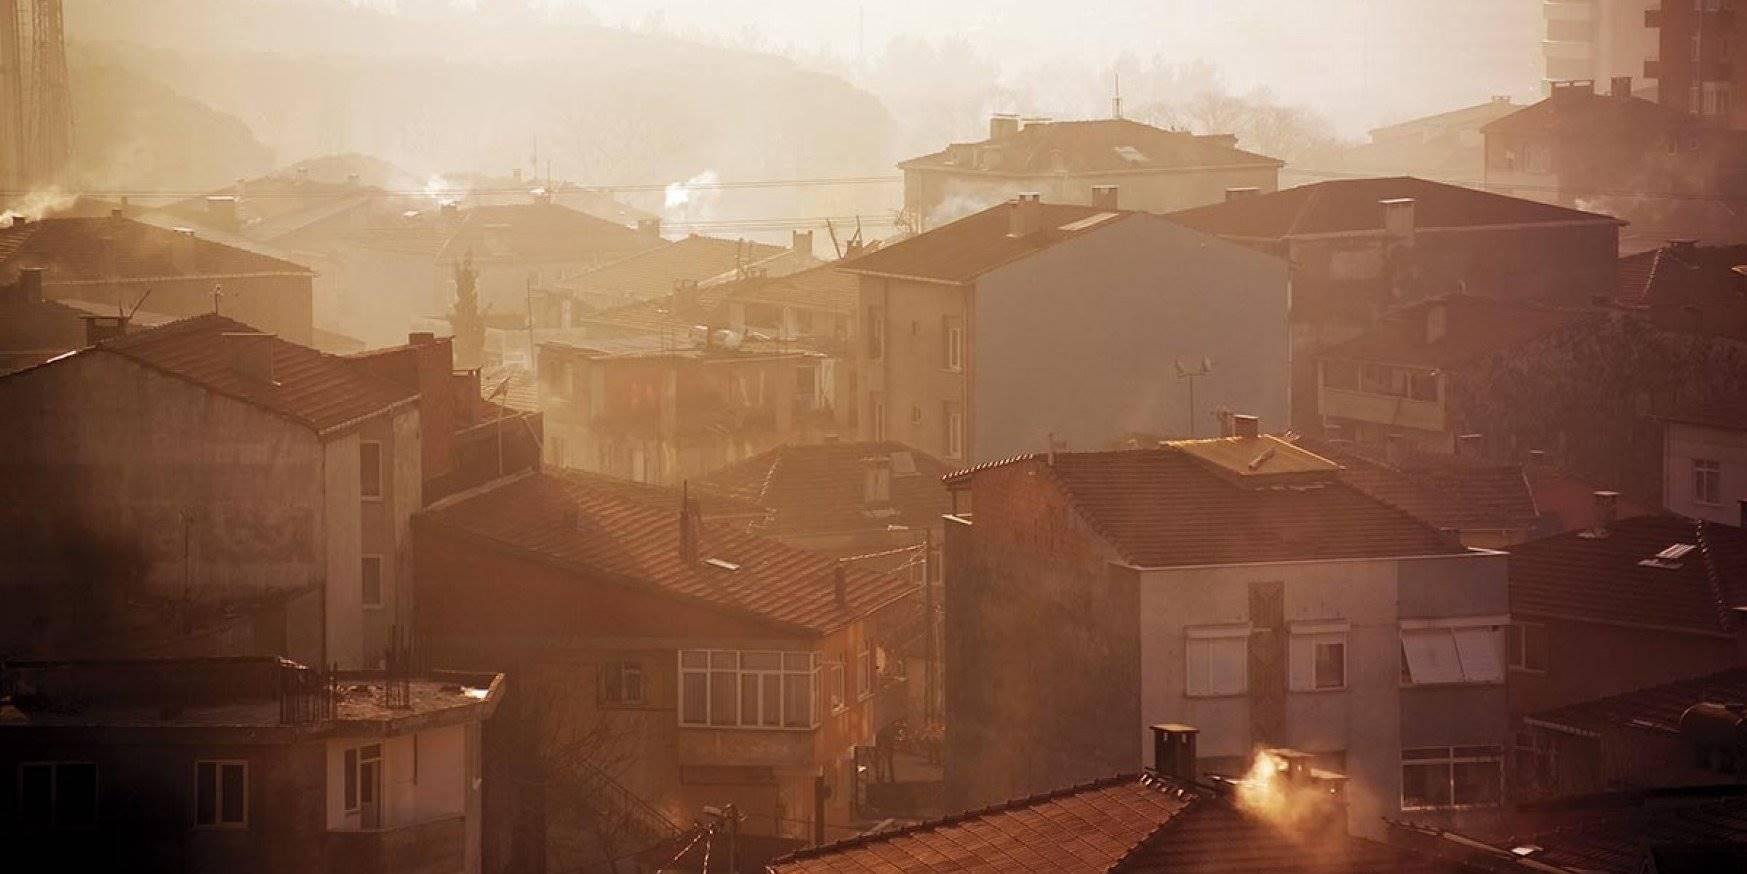 Istanbul Hava Kirliligi Alerjik Astim Koah Saglik1